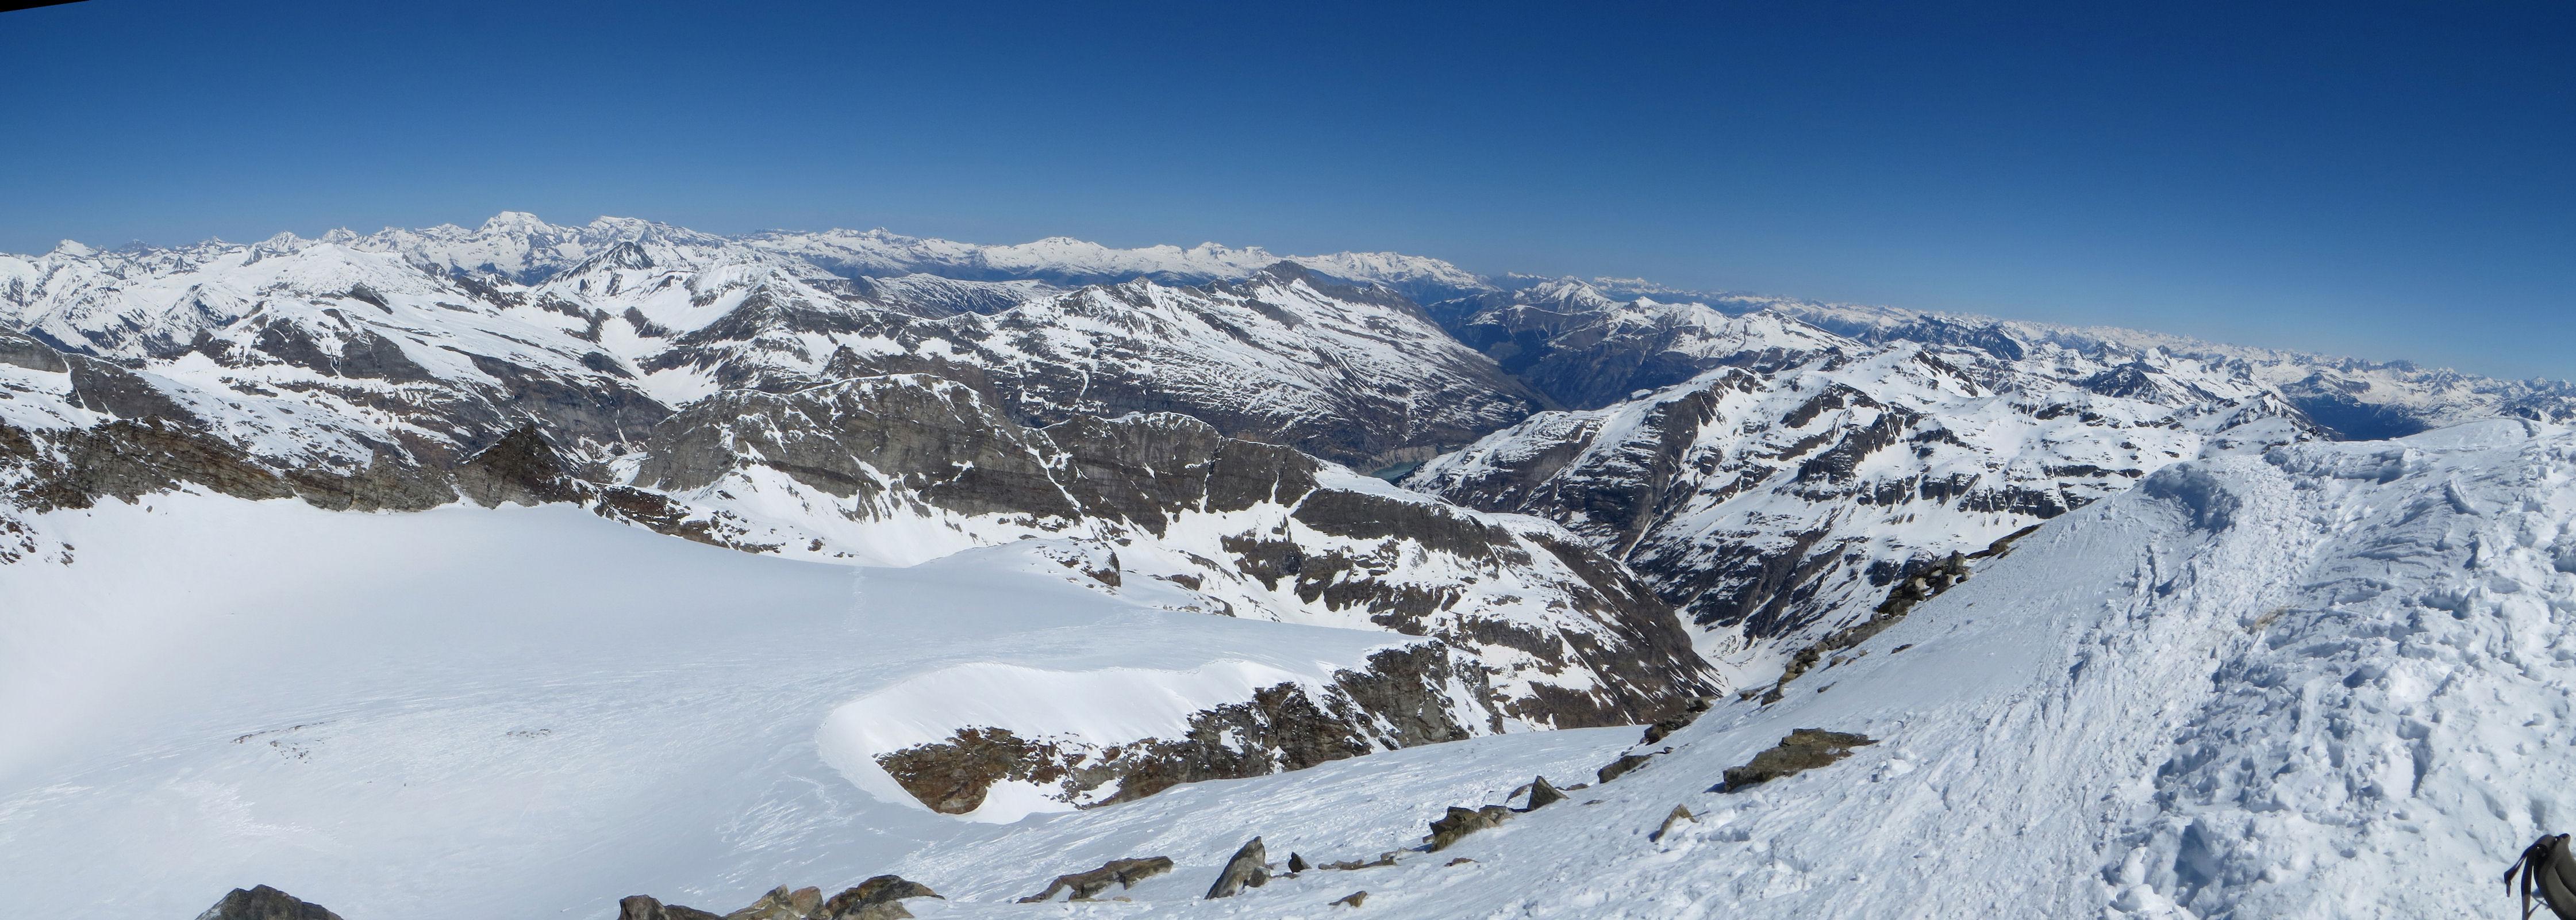 1600-STA_5469 Panorama